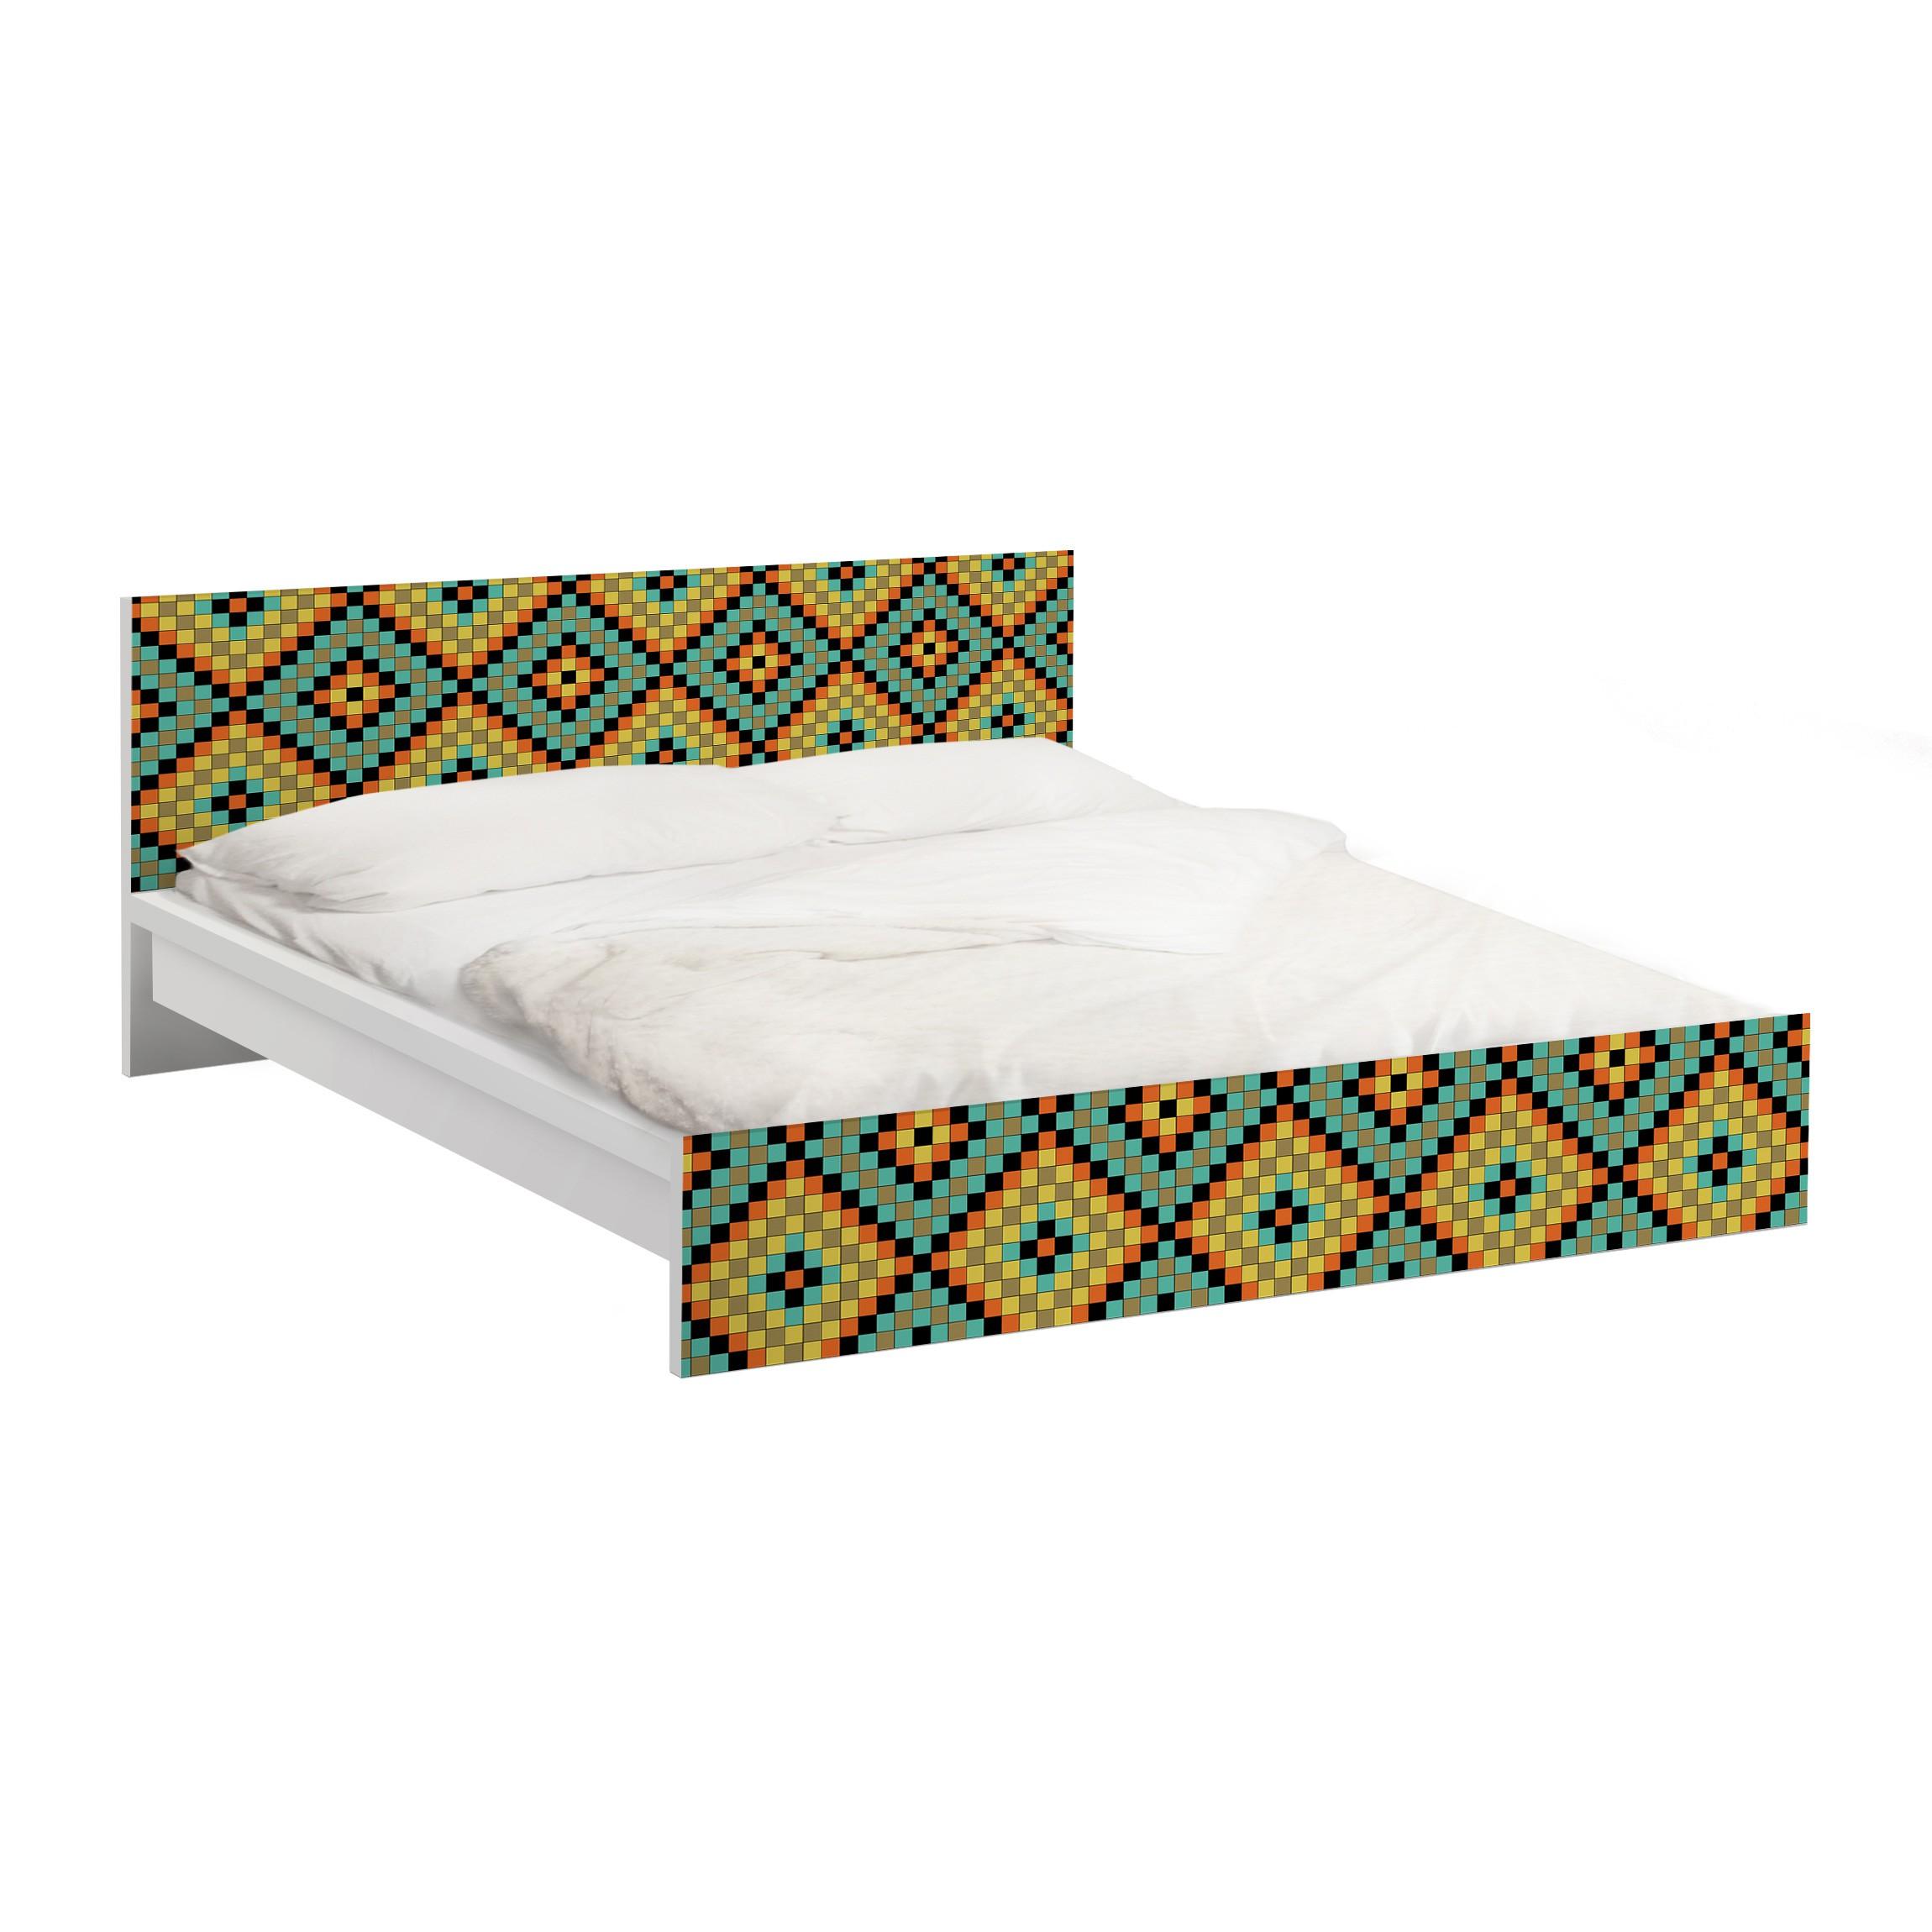 m belfolie f r ikea malm bett niedrig 140x200cm klebefolie buntes mosaik. Black Bedroom Furniture Sets. Home Design Ideas